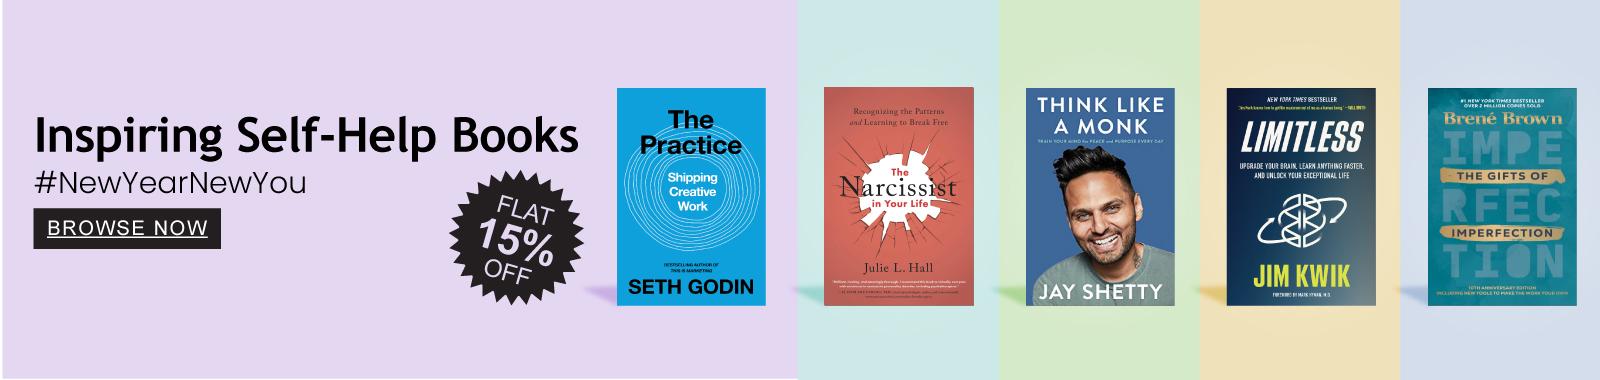 Inspiring Self help books